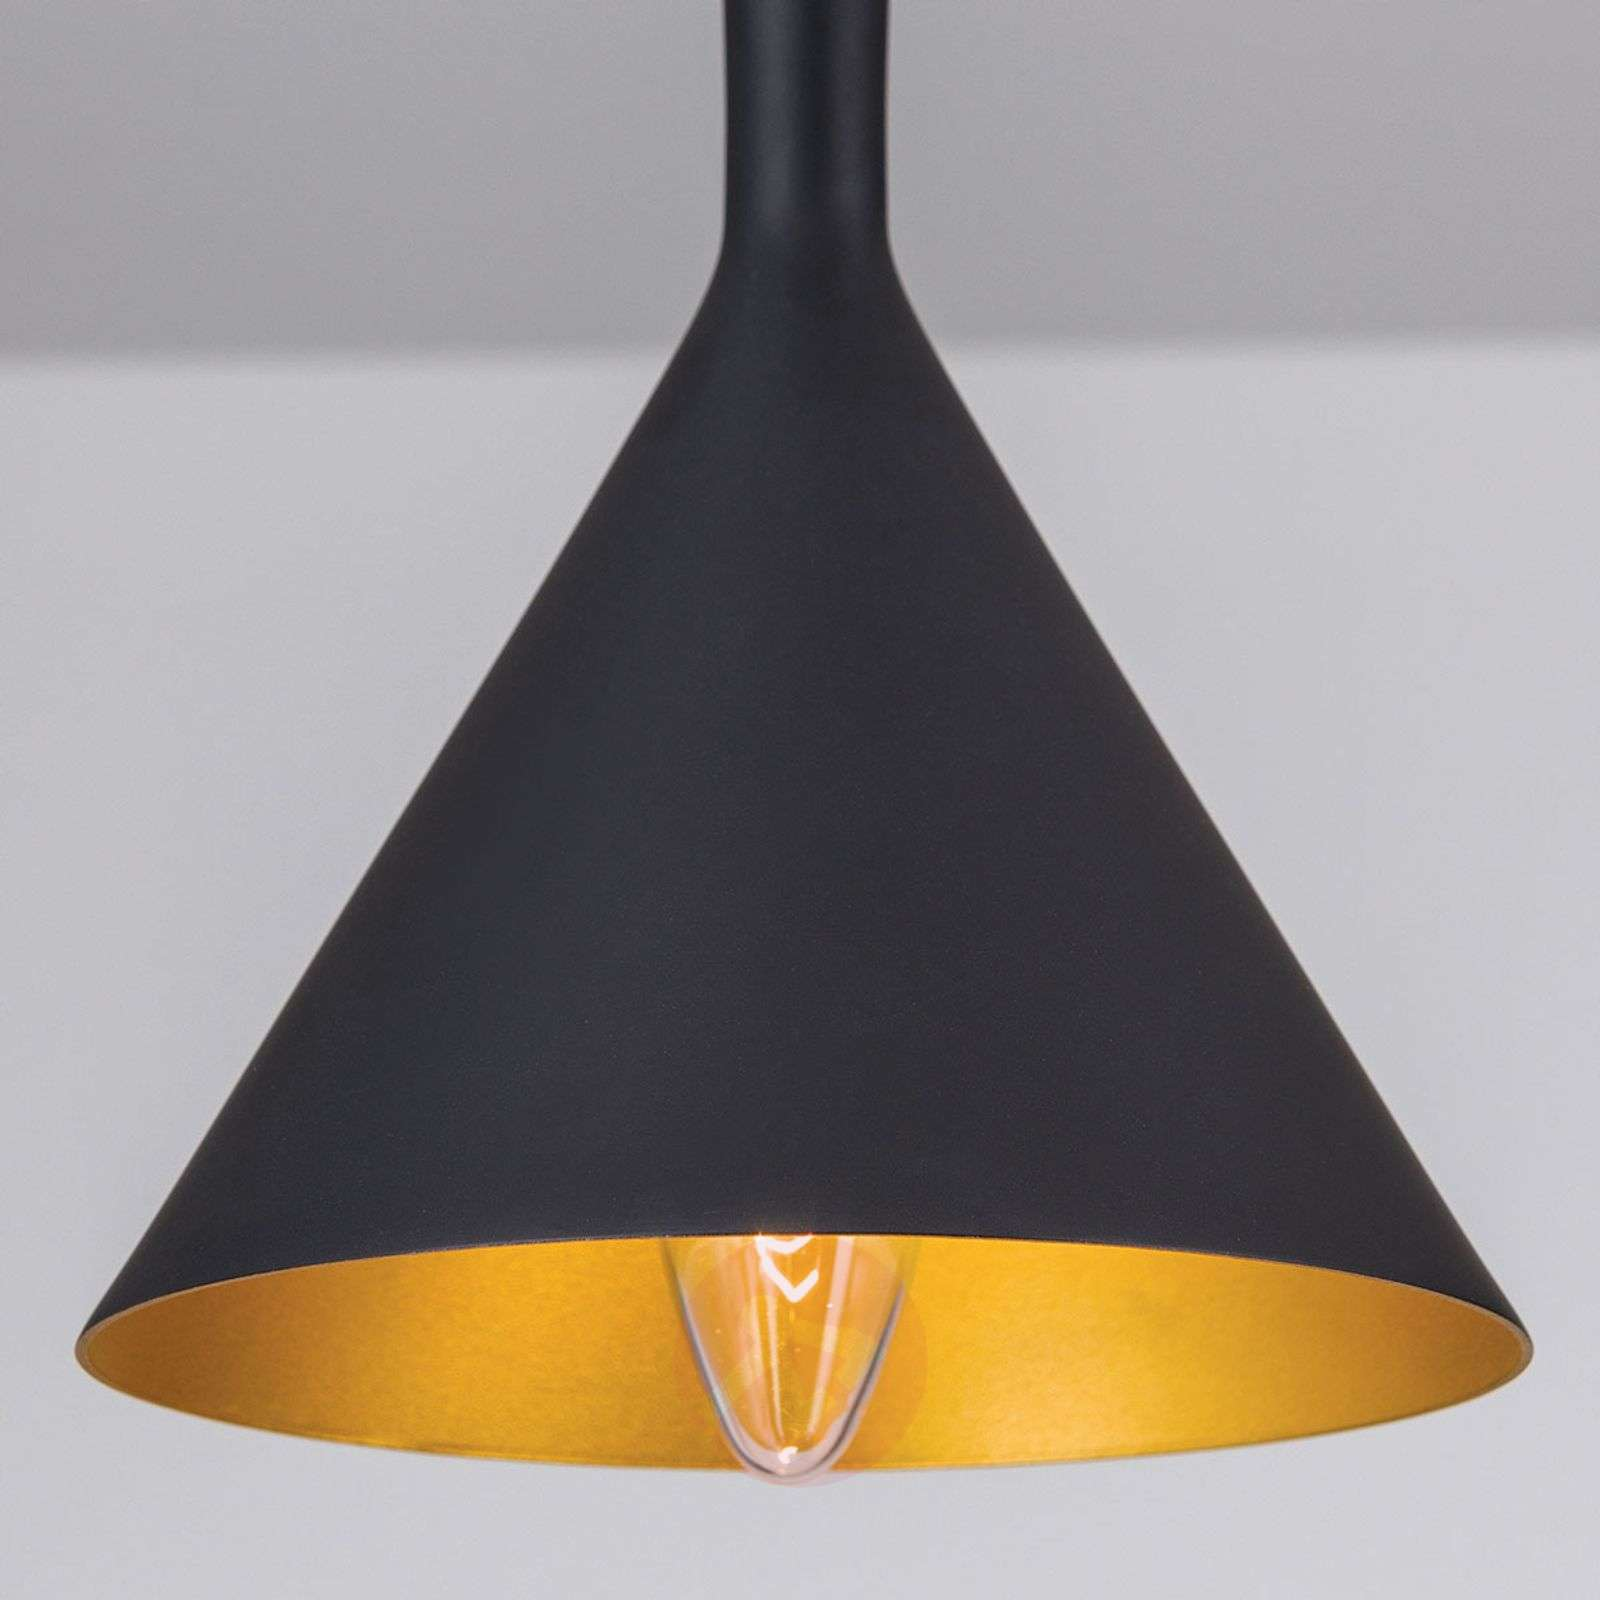 Cone-shaped hanging lamp Gunda in black and gold-7255356-01